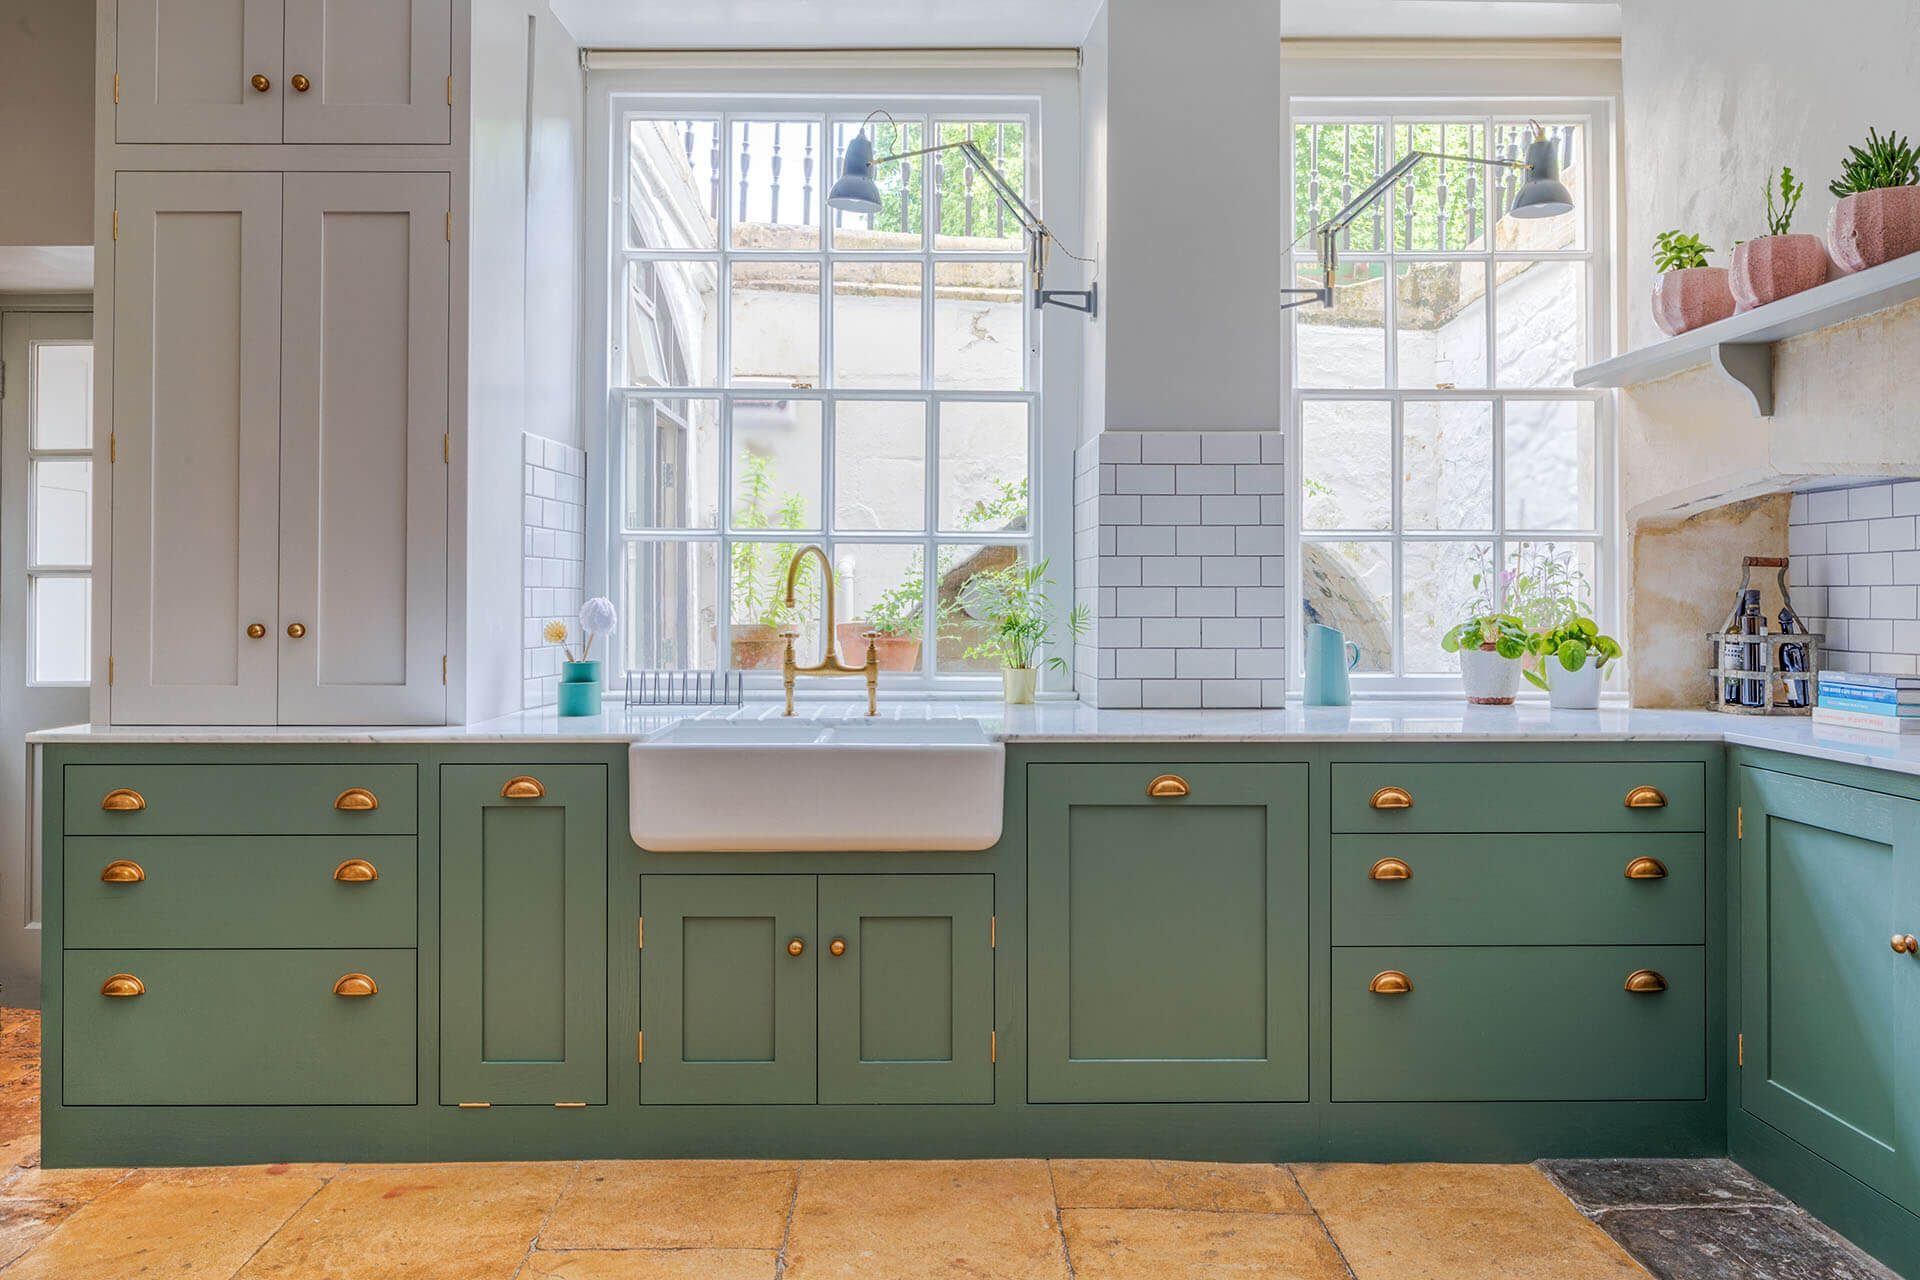 The Green Shaker Kitchen Sustainable Kitchens Dark Green Kitchen Turquoise Kitchen Cabinets Kitchen Cabinet Styles